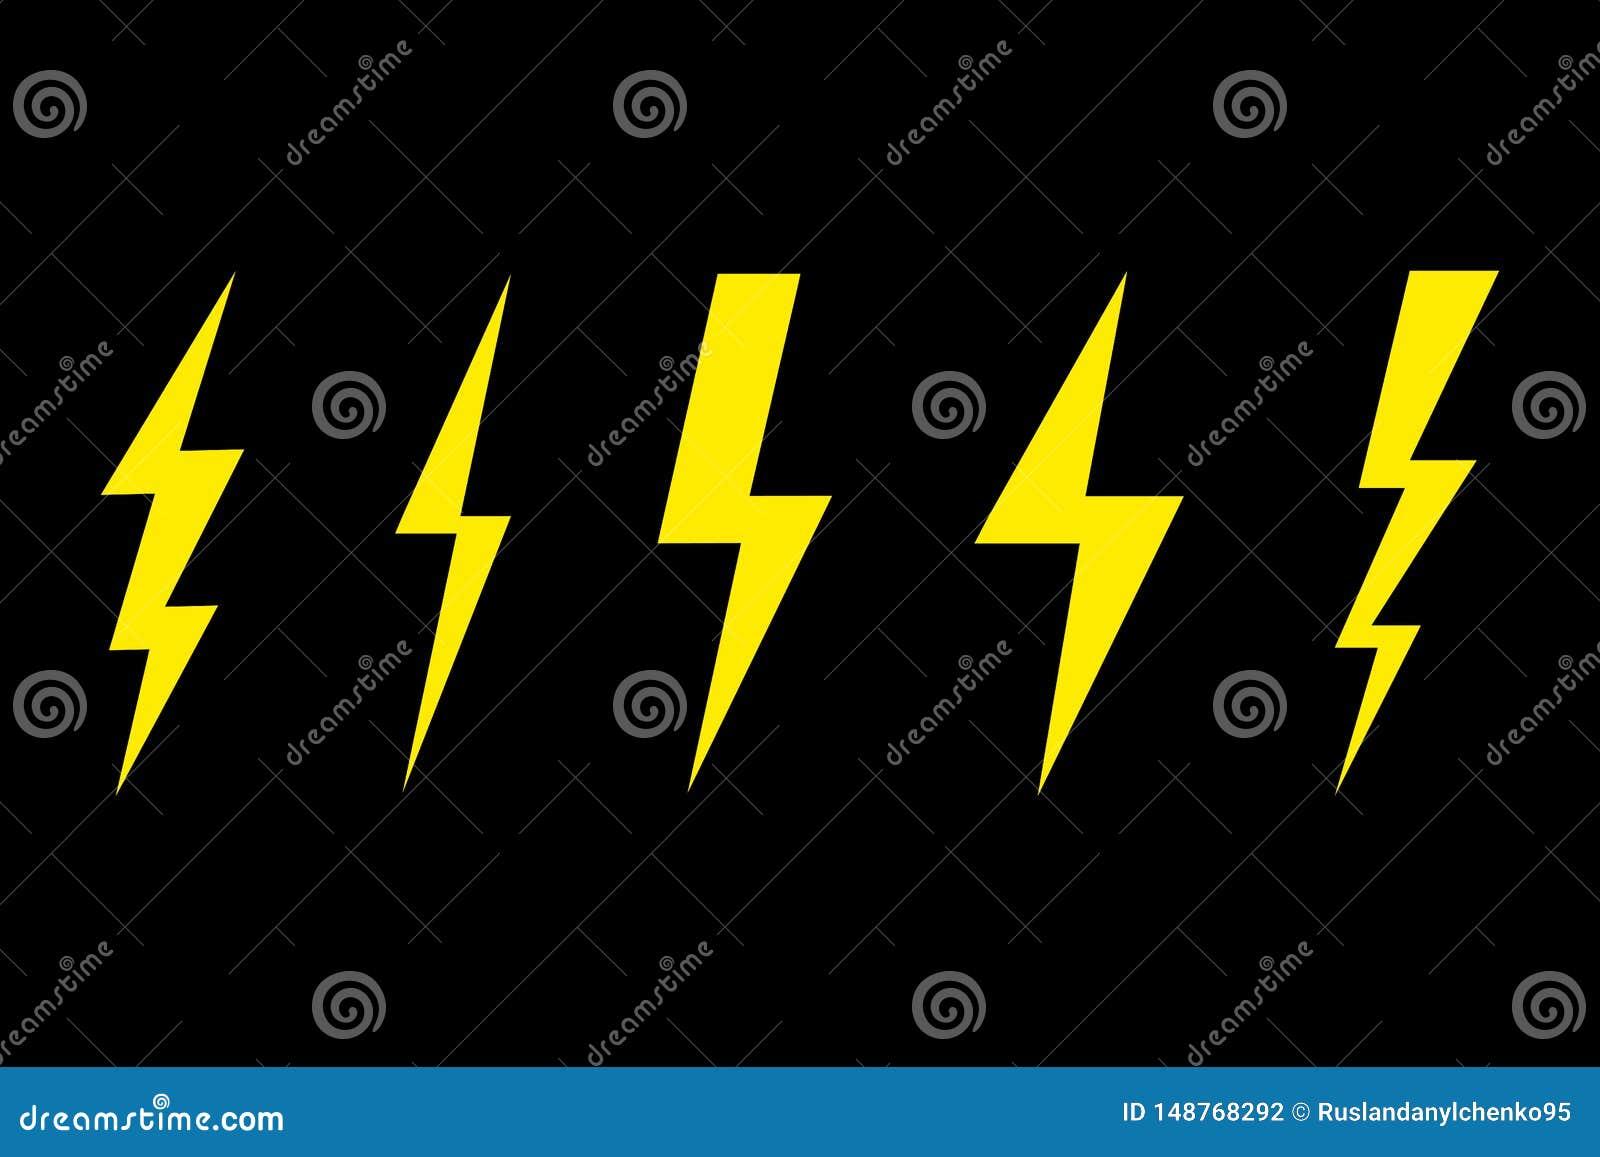 Thunder And Lightning Lighting Bolt Flash Icon Set Set Of Lightning On A Black Background Vector Illustration Stock Vector Illustration Of Instantly Design 148768292